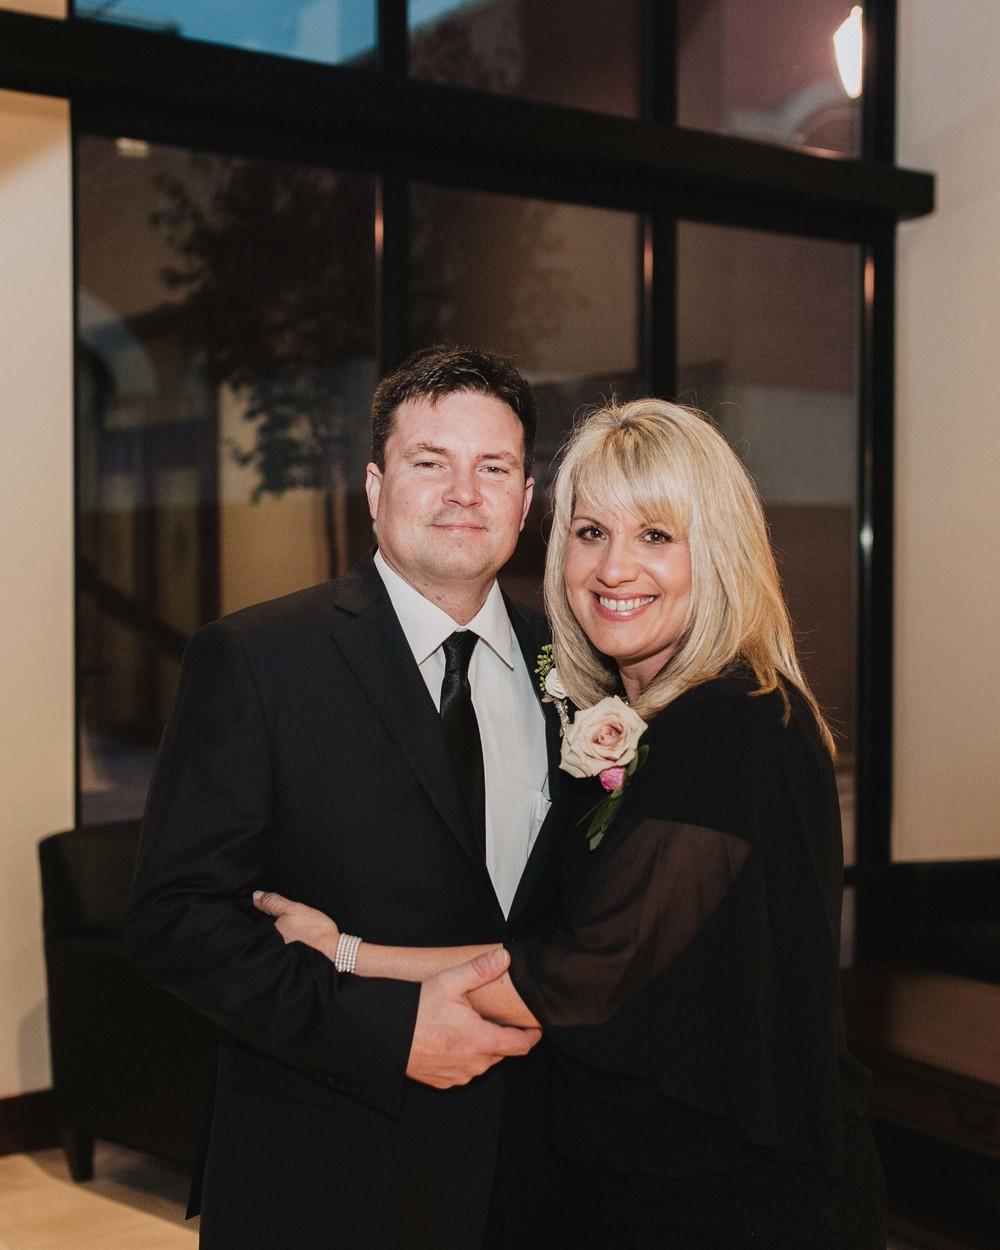 Salt-Lake-City-Wedding-Photographer-36.jpg